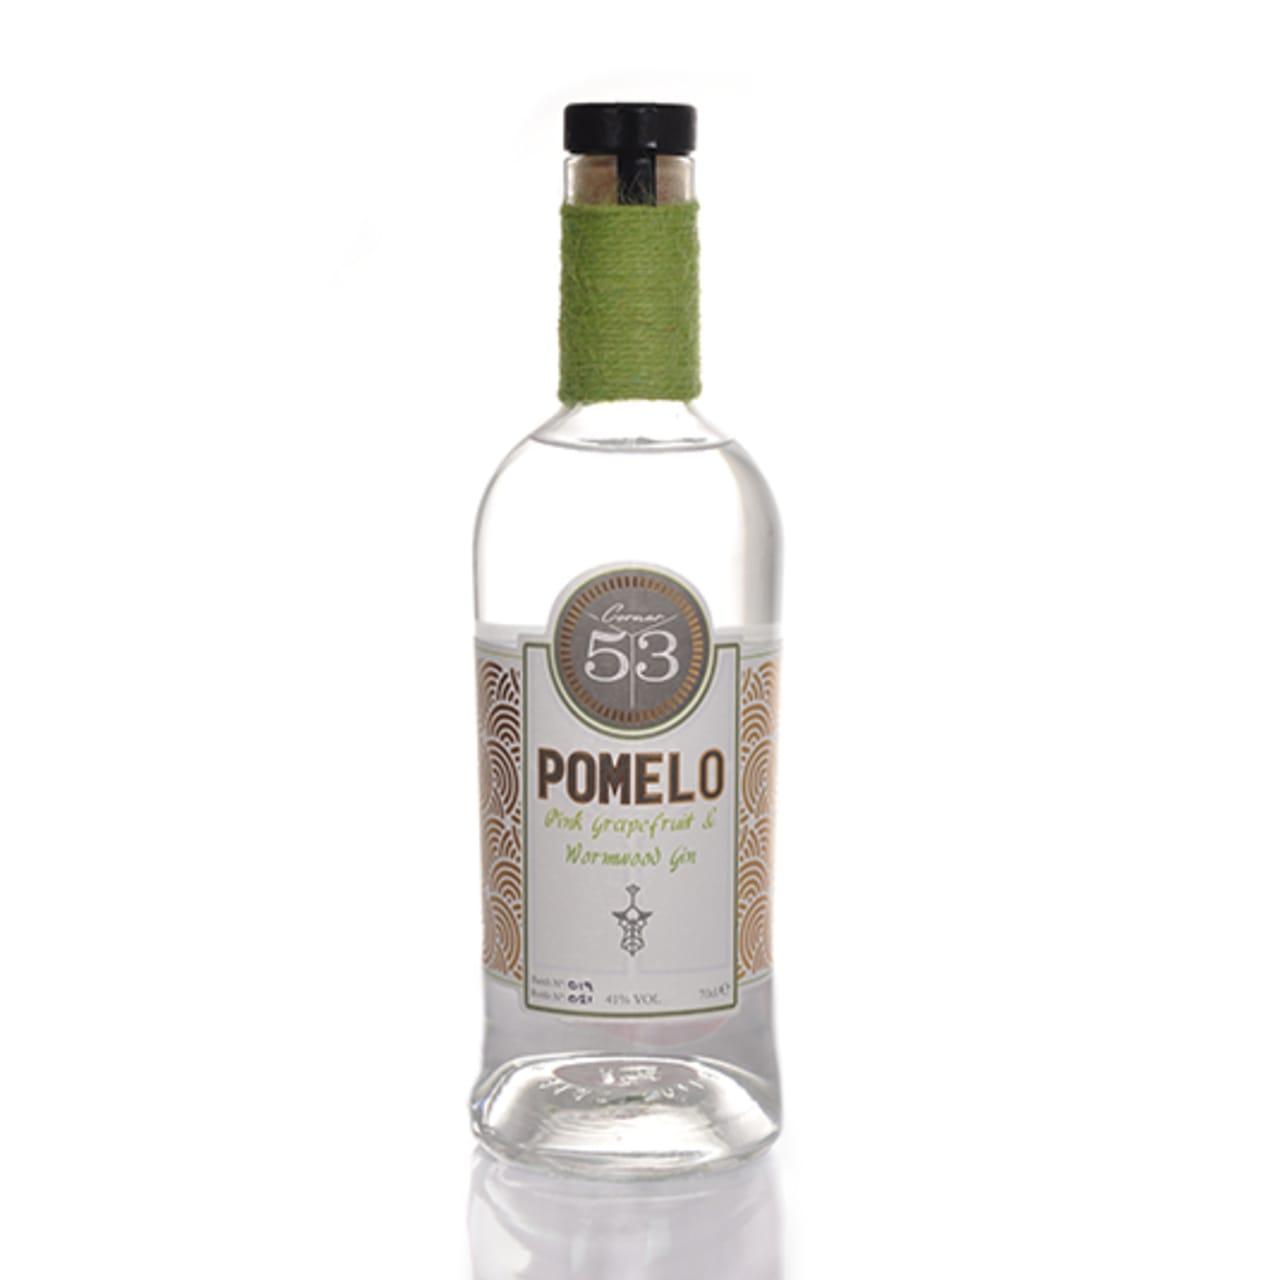 Product Image - Corner 53 Pomelo Gin